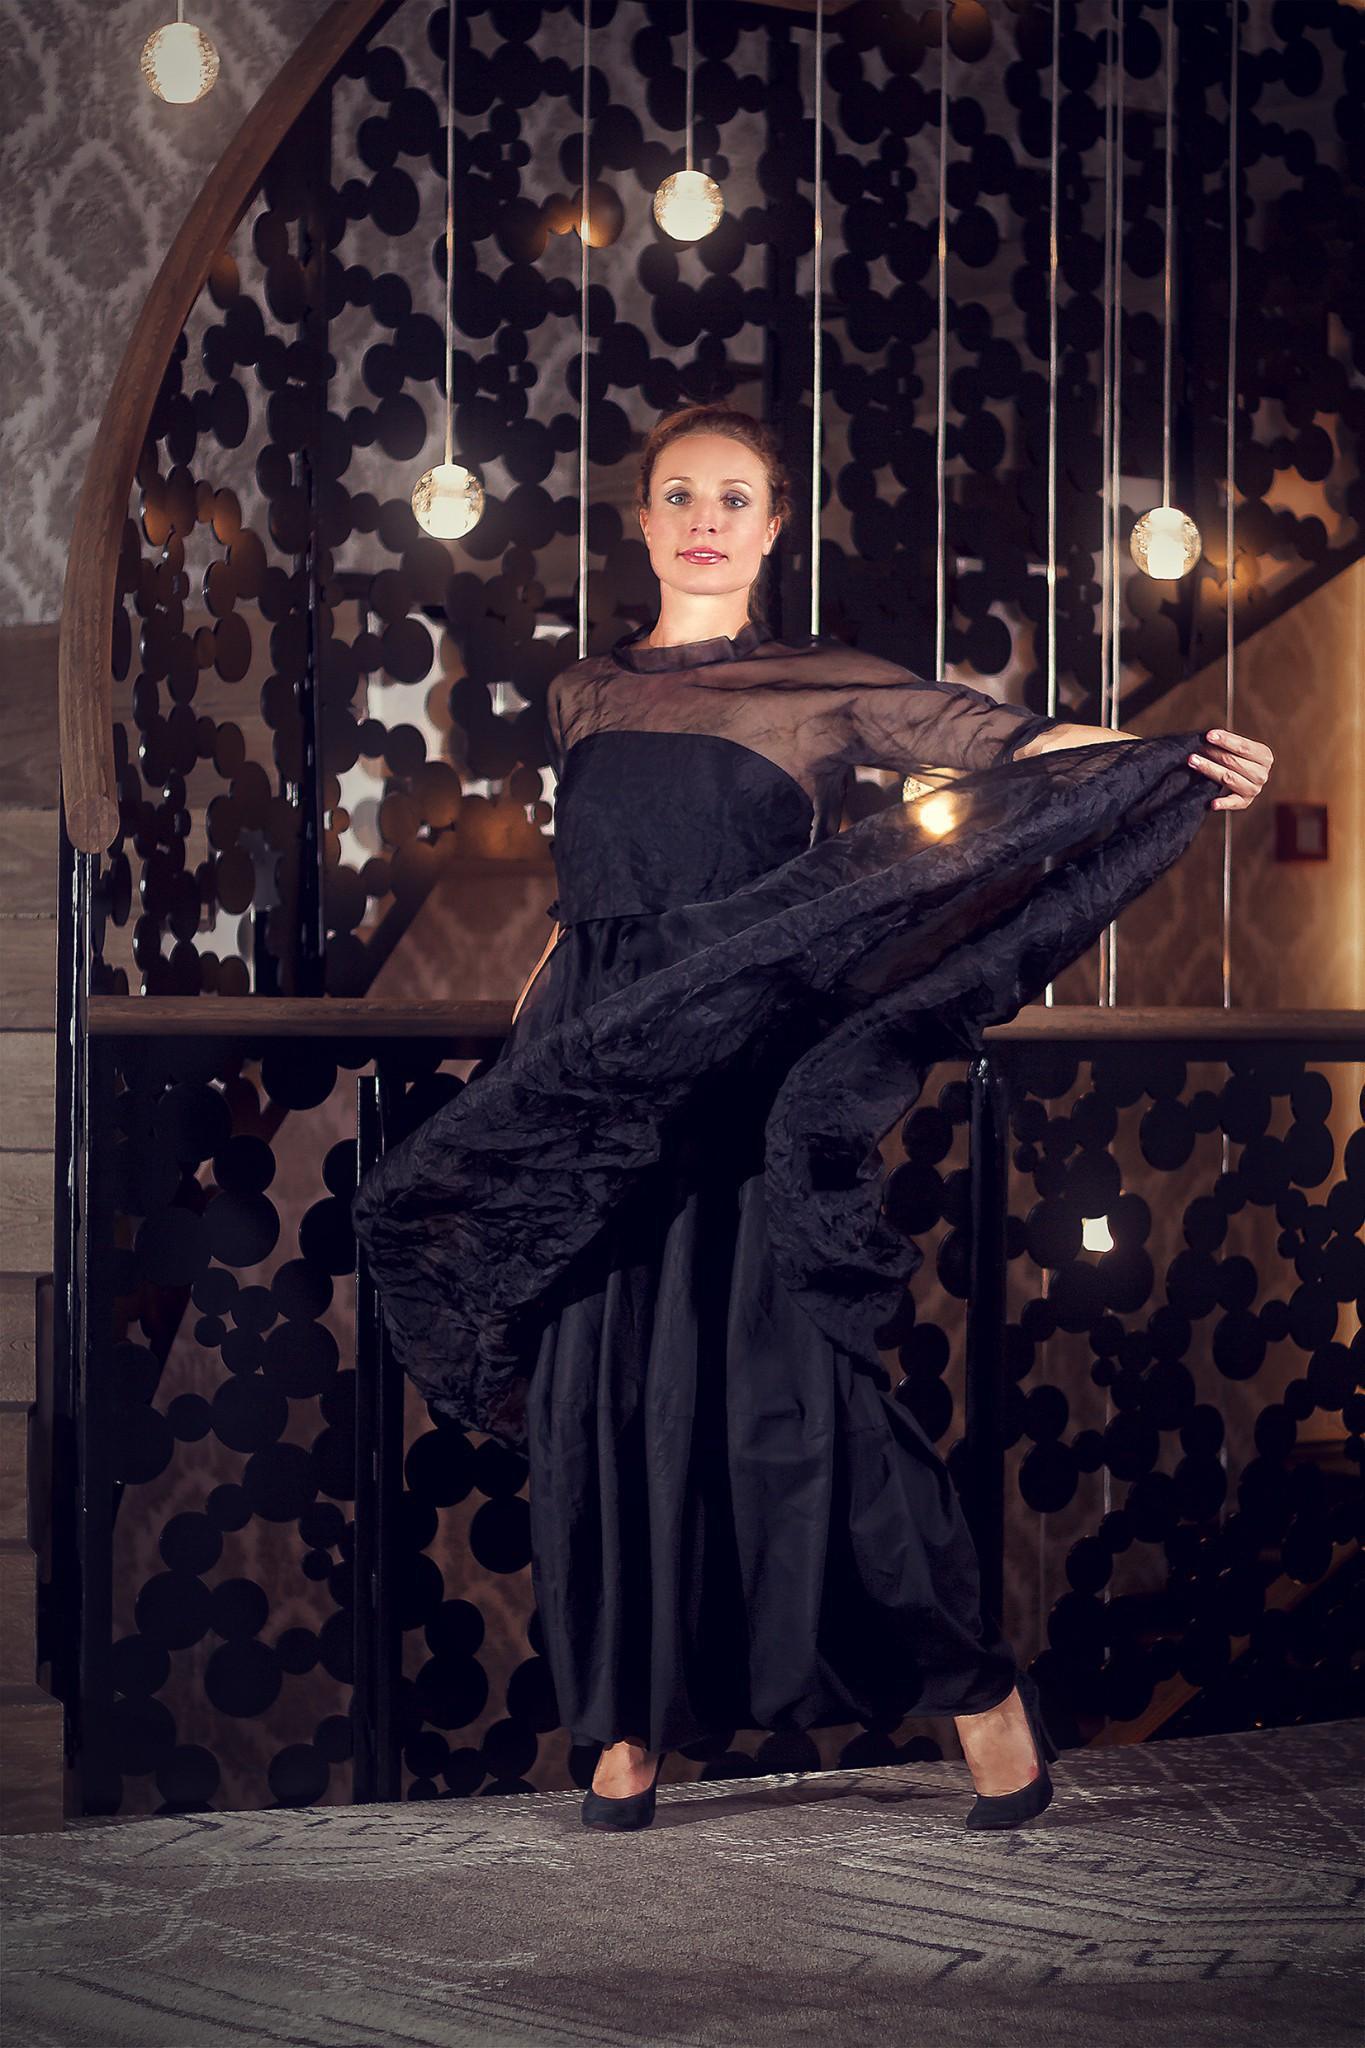 ValentinaKopp_S1_503_Print